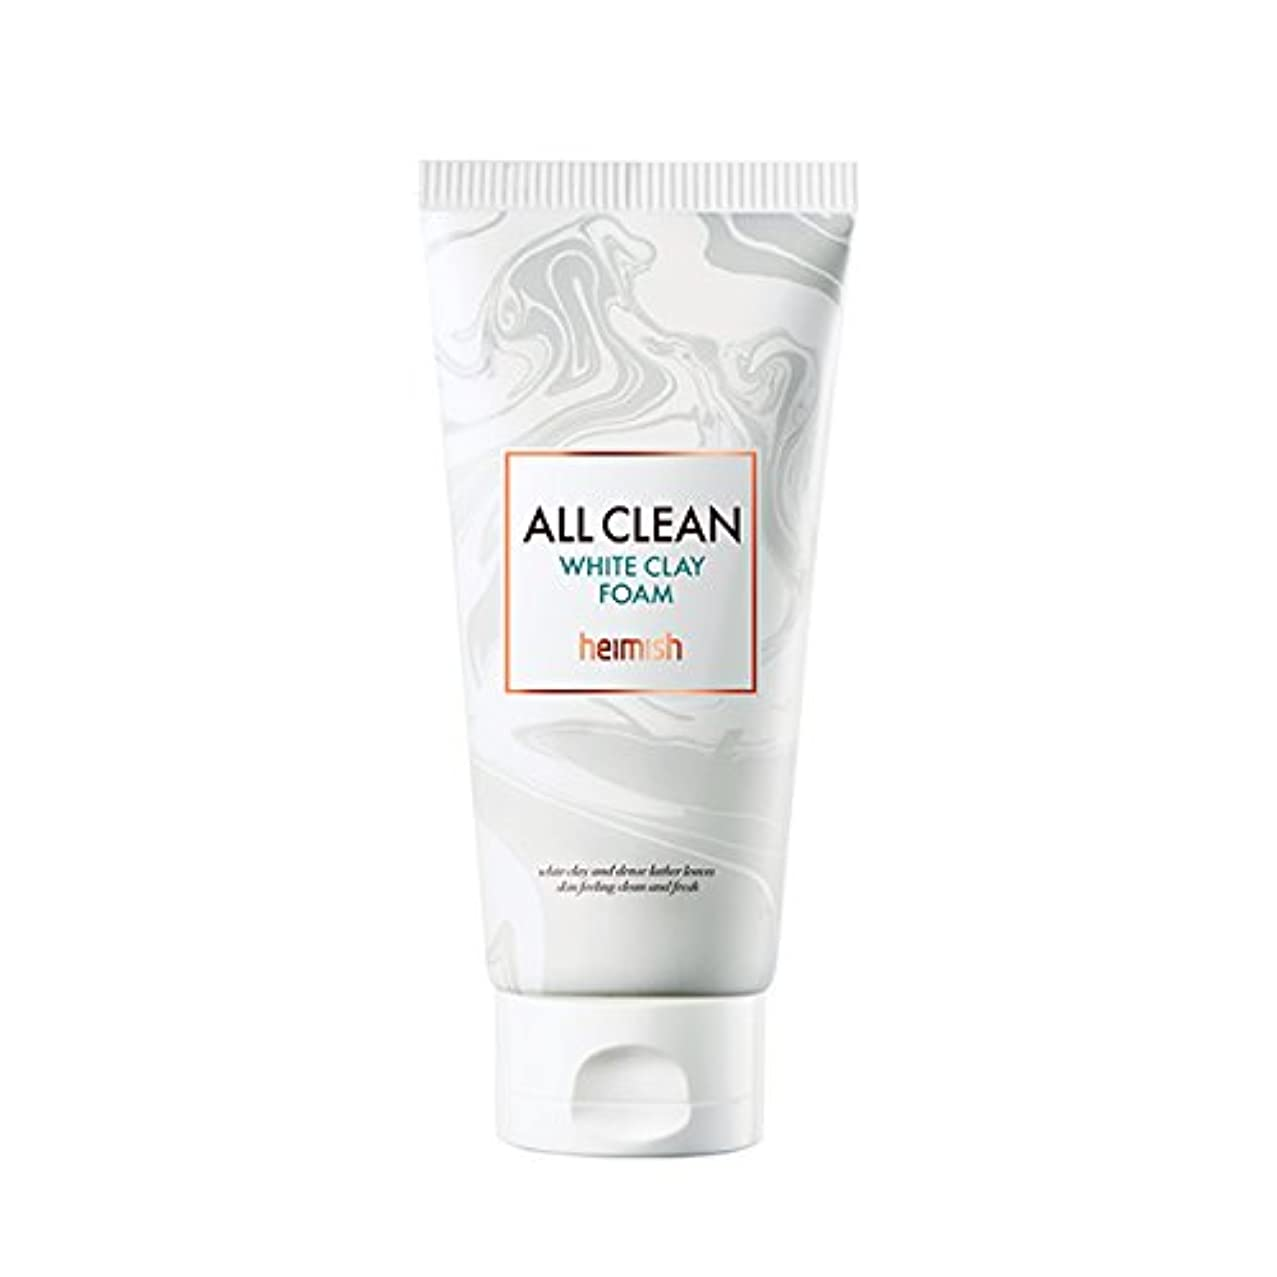 heimish All Clean White Clay Foam 150g/ヘイミッシュ オールクリーン ホワイト クレイ フォーム 150g